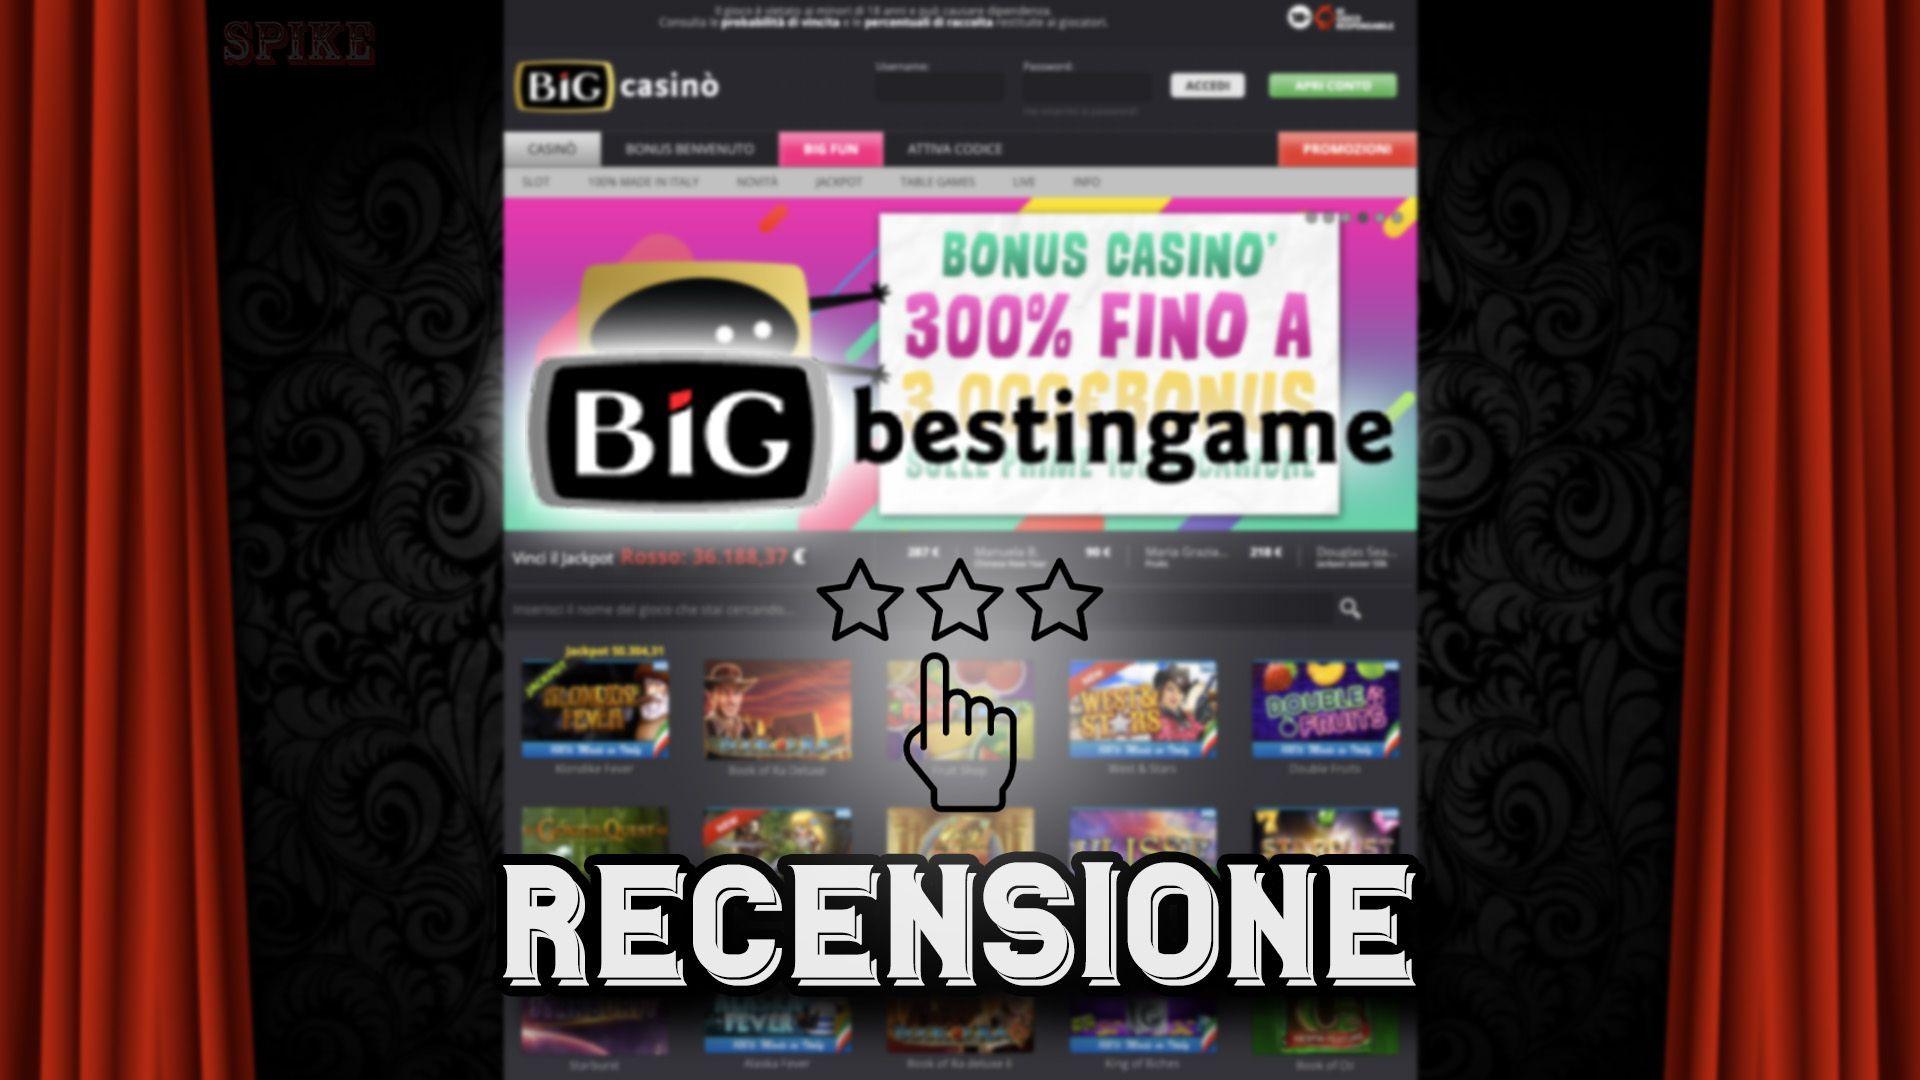 Big Online Casino Guida Recensione Gratuita